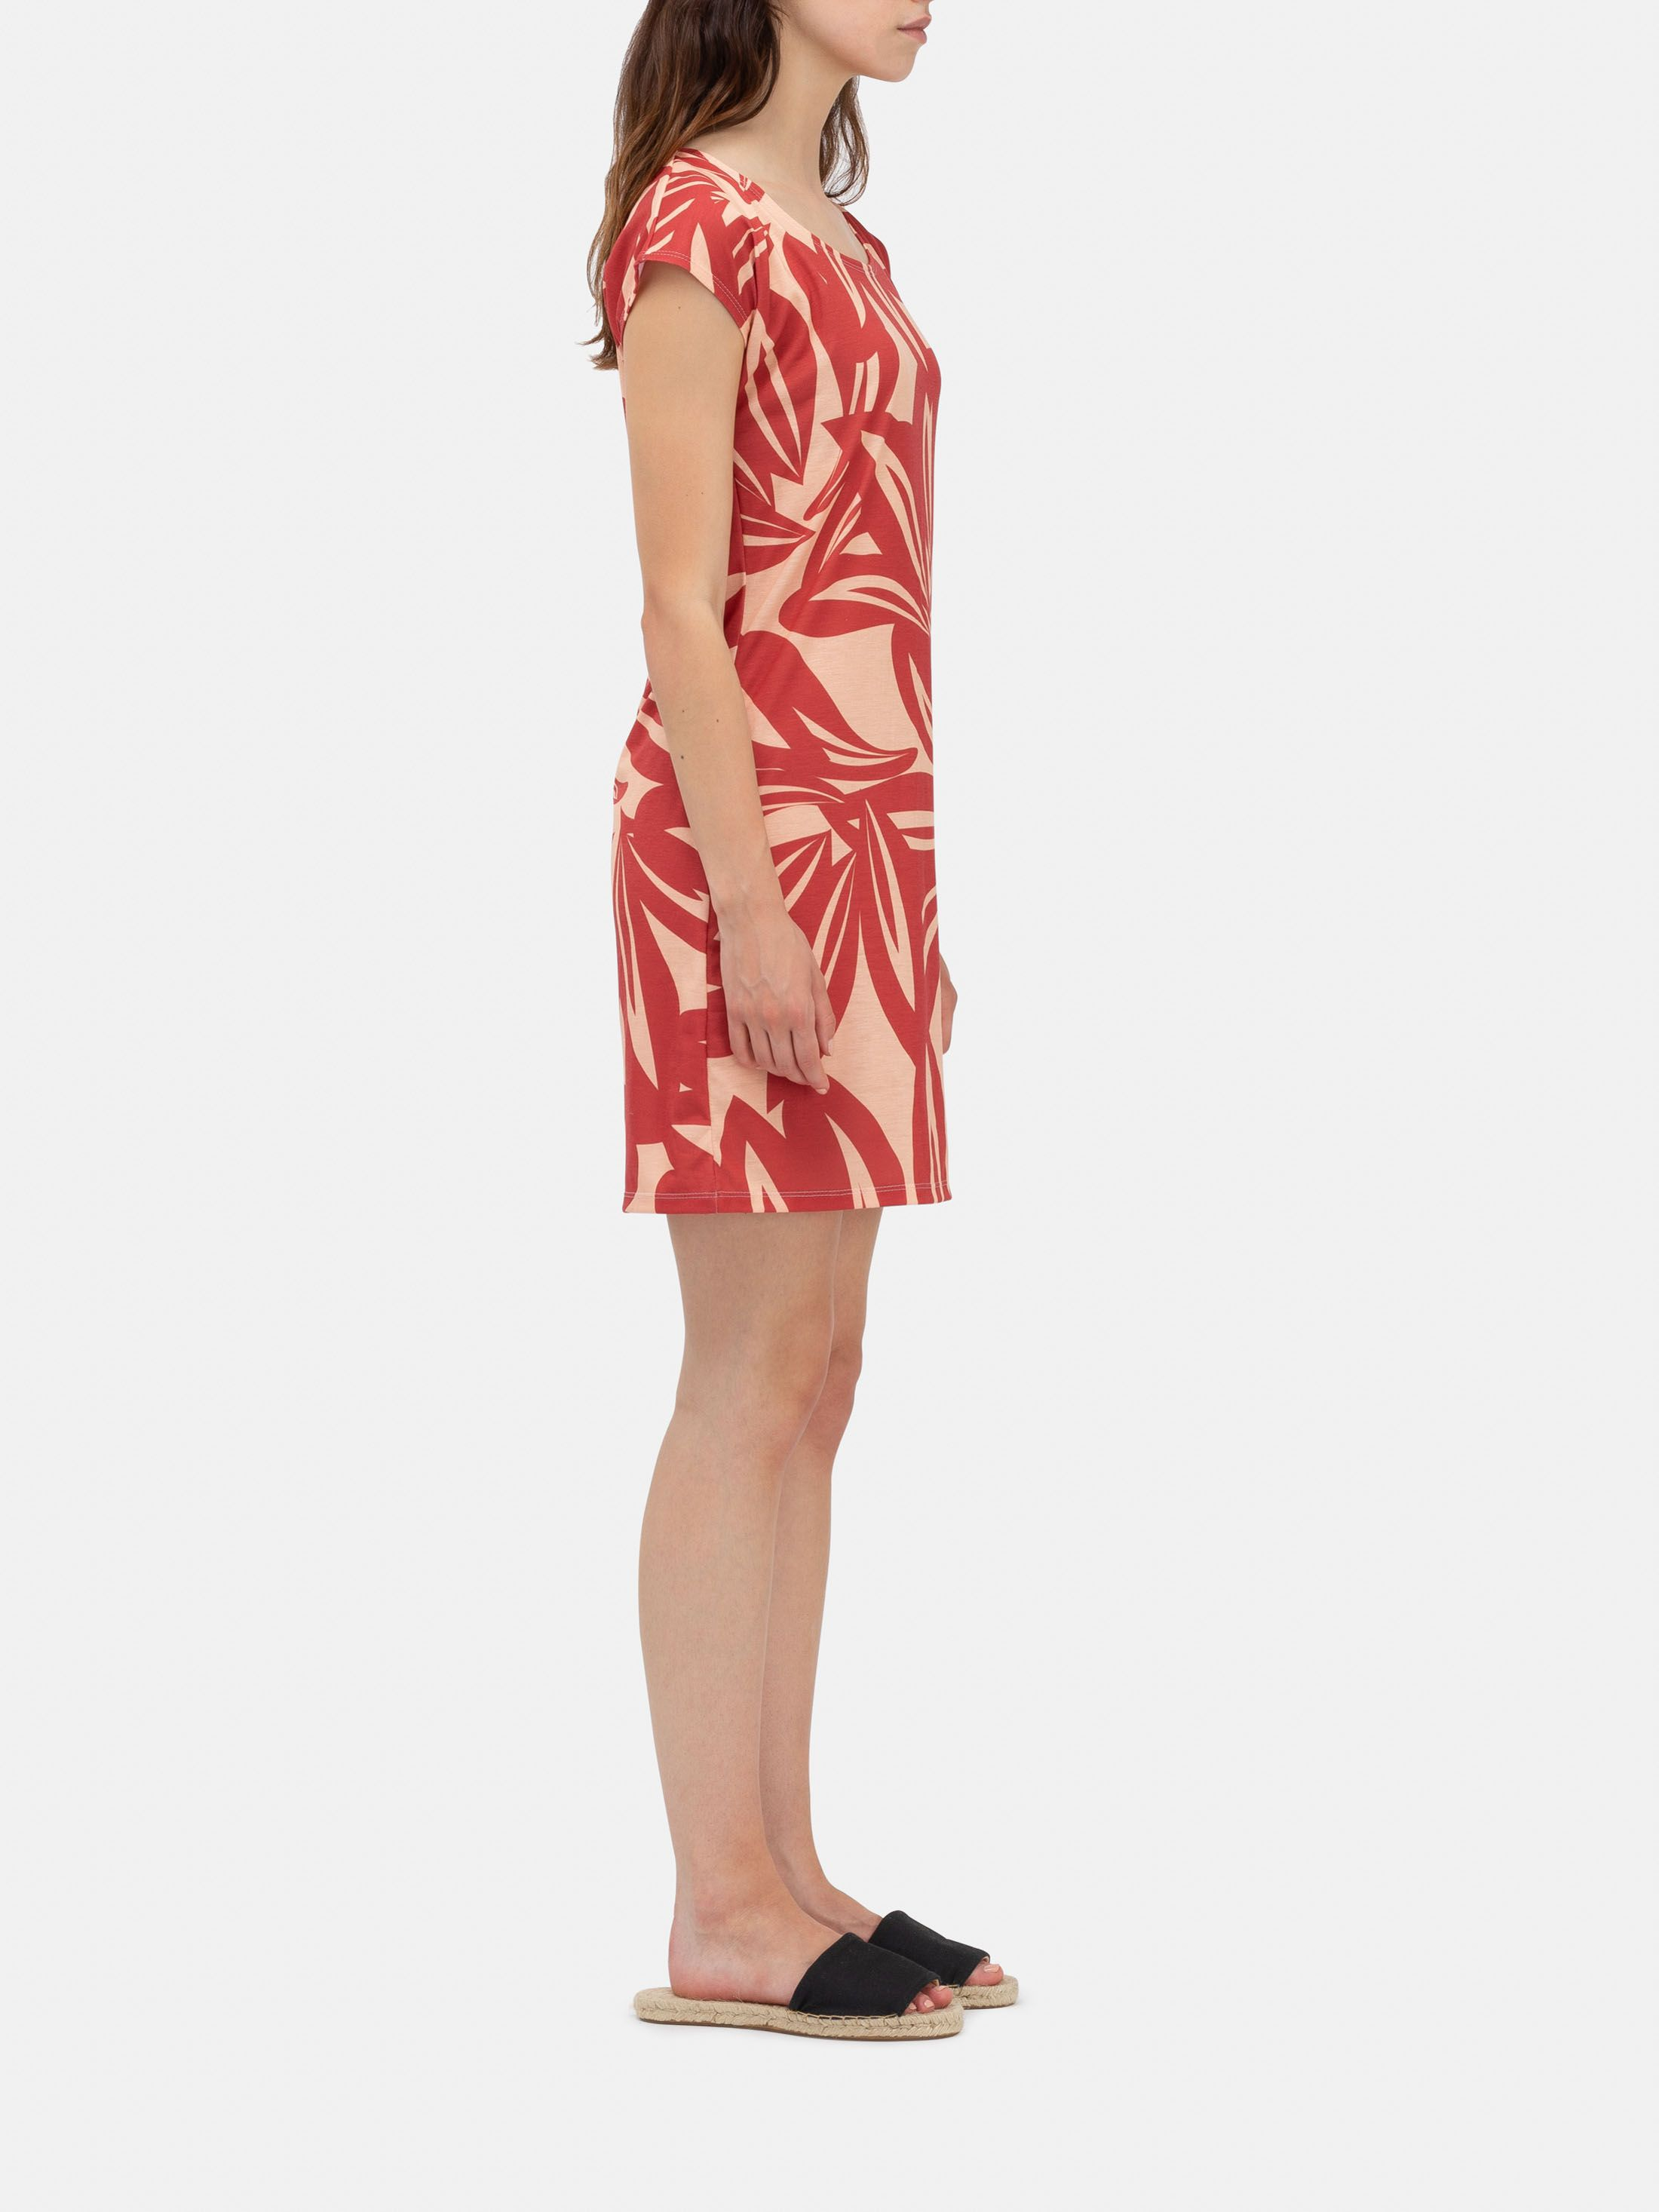 jersey dress fabric longline ladies